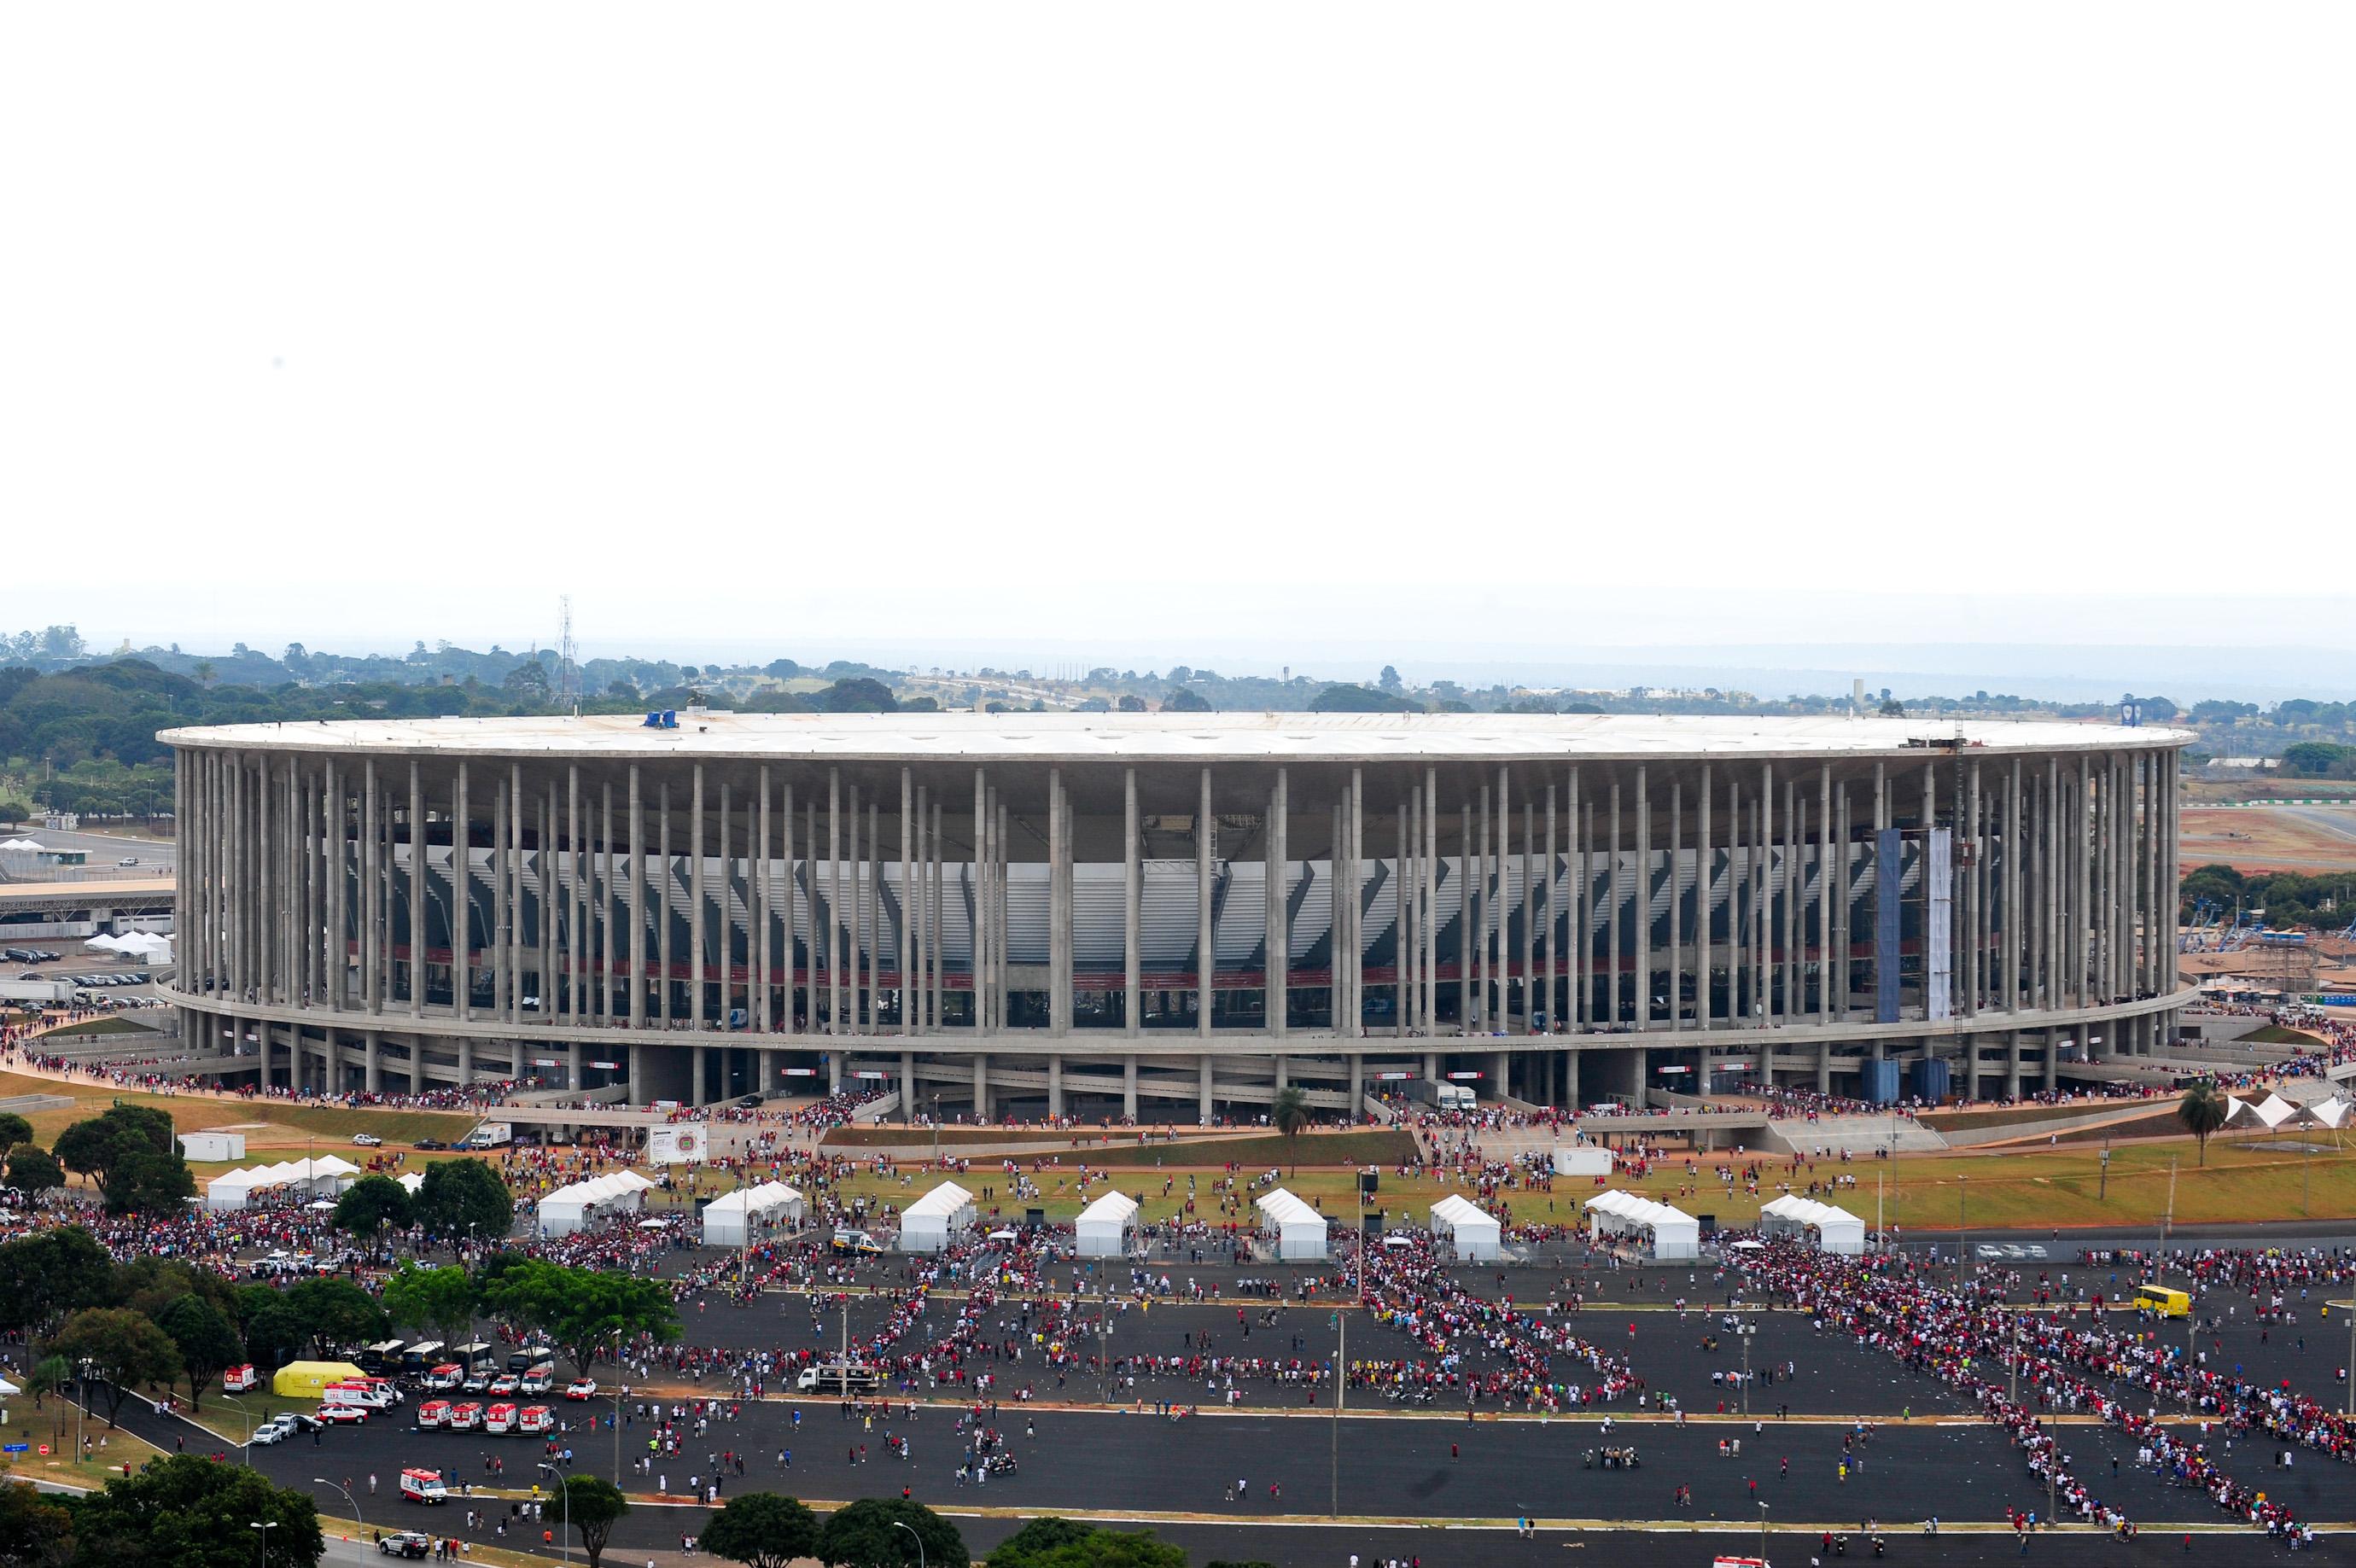 Estadio Nacional de Brasilia Mane Garrincha